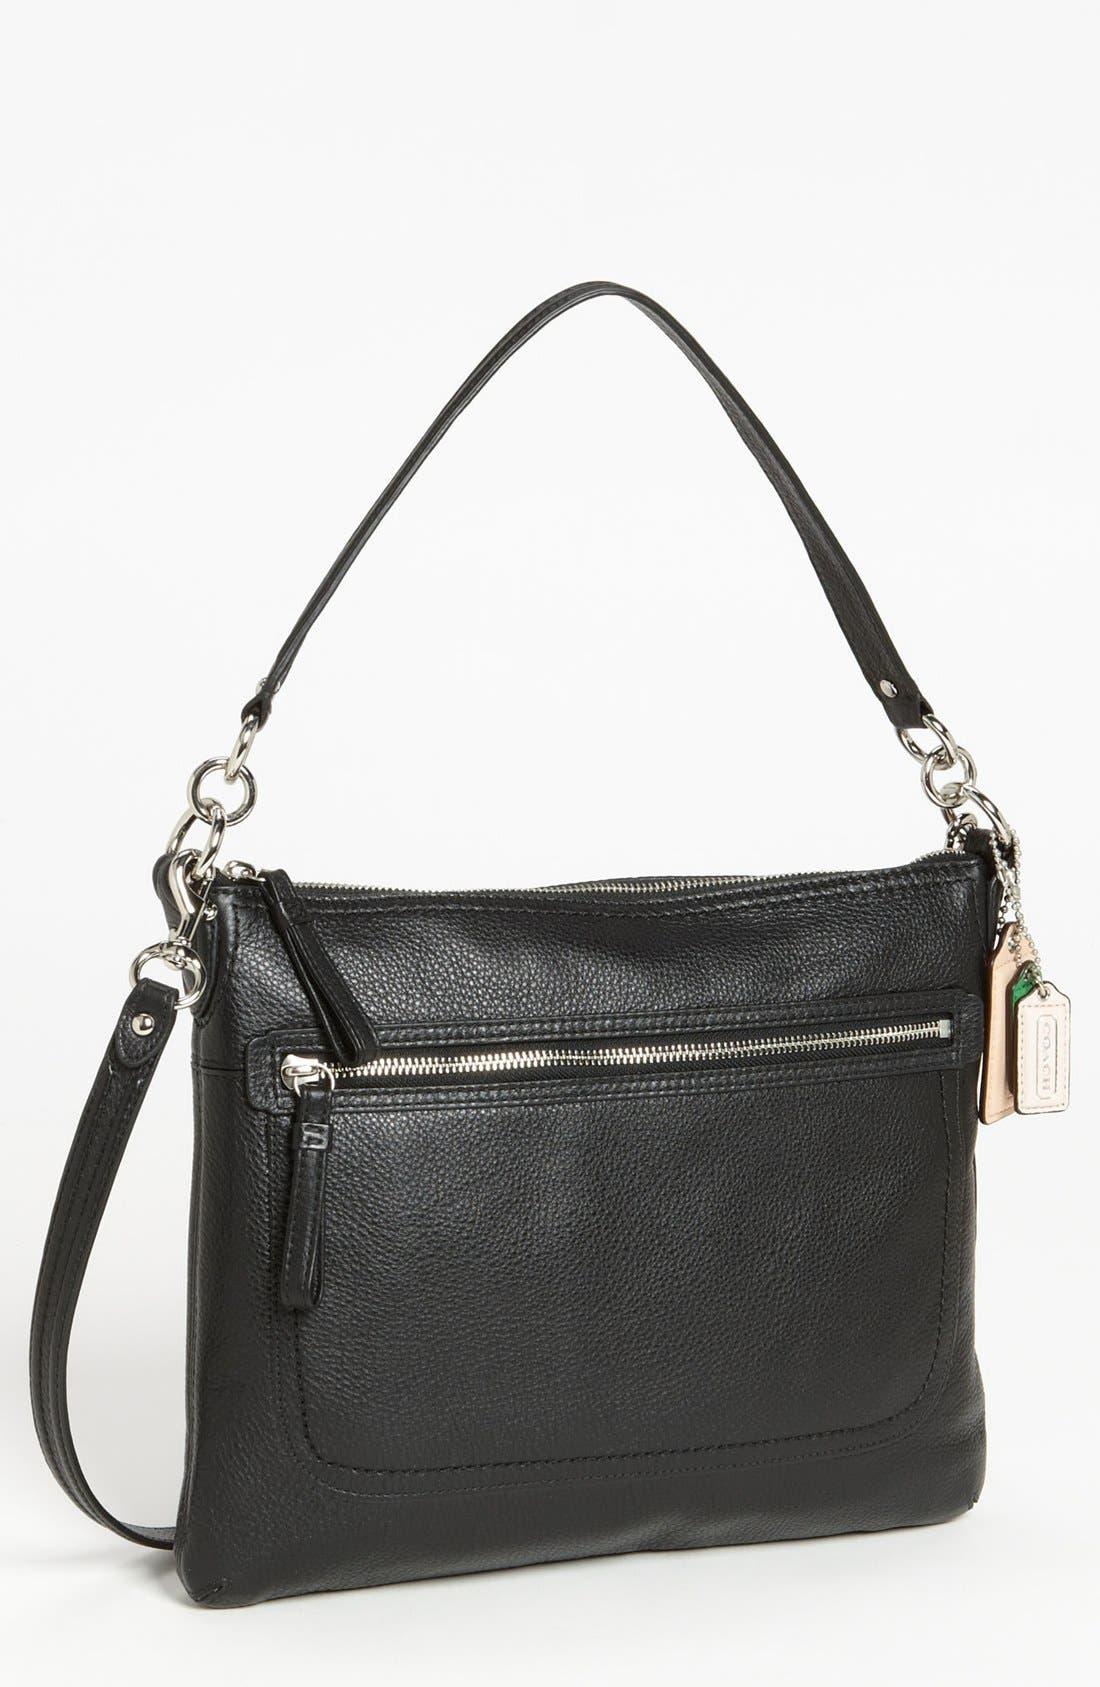 Main Image - COACH 'Poppy - Perri Hippie' Leather Crossbody Bag, Medium